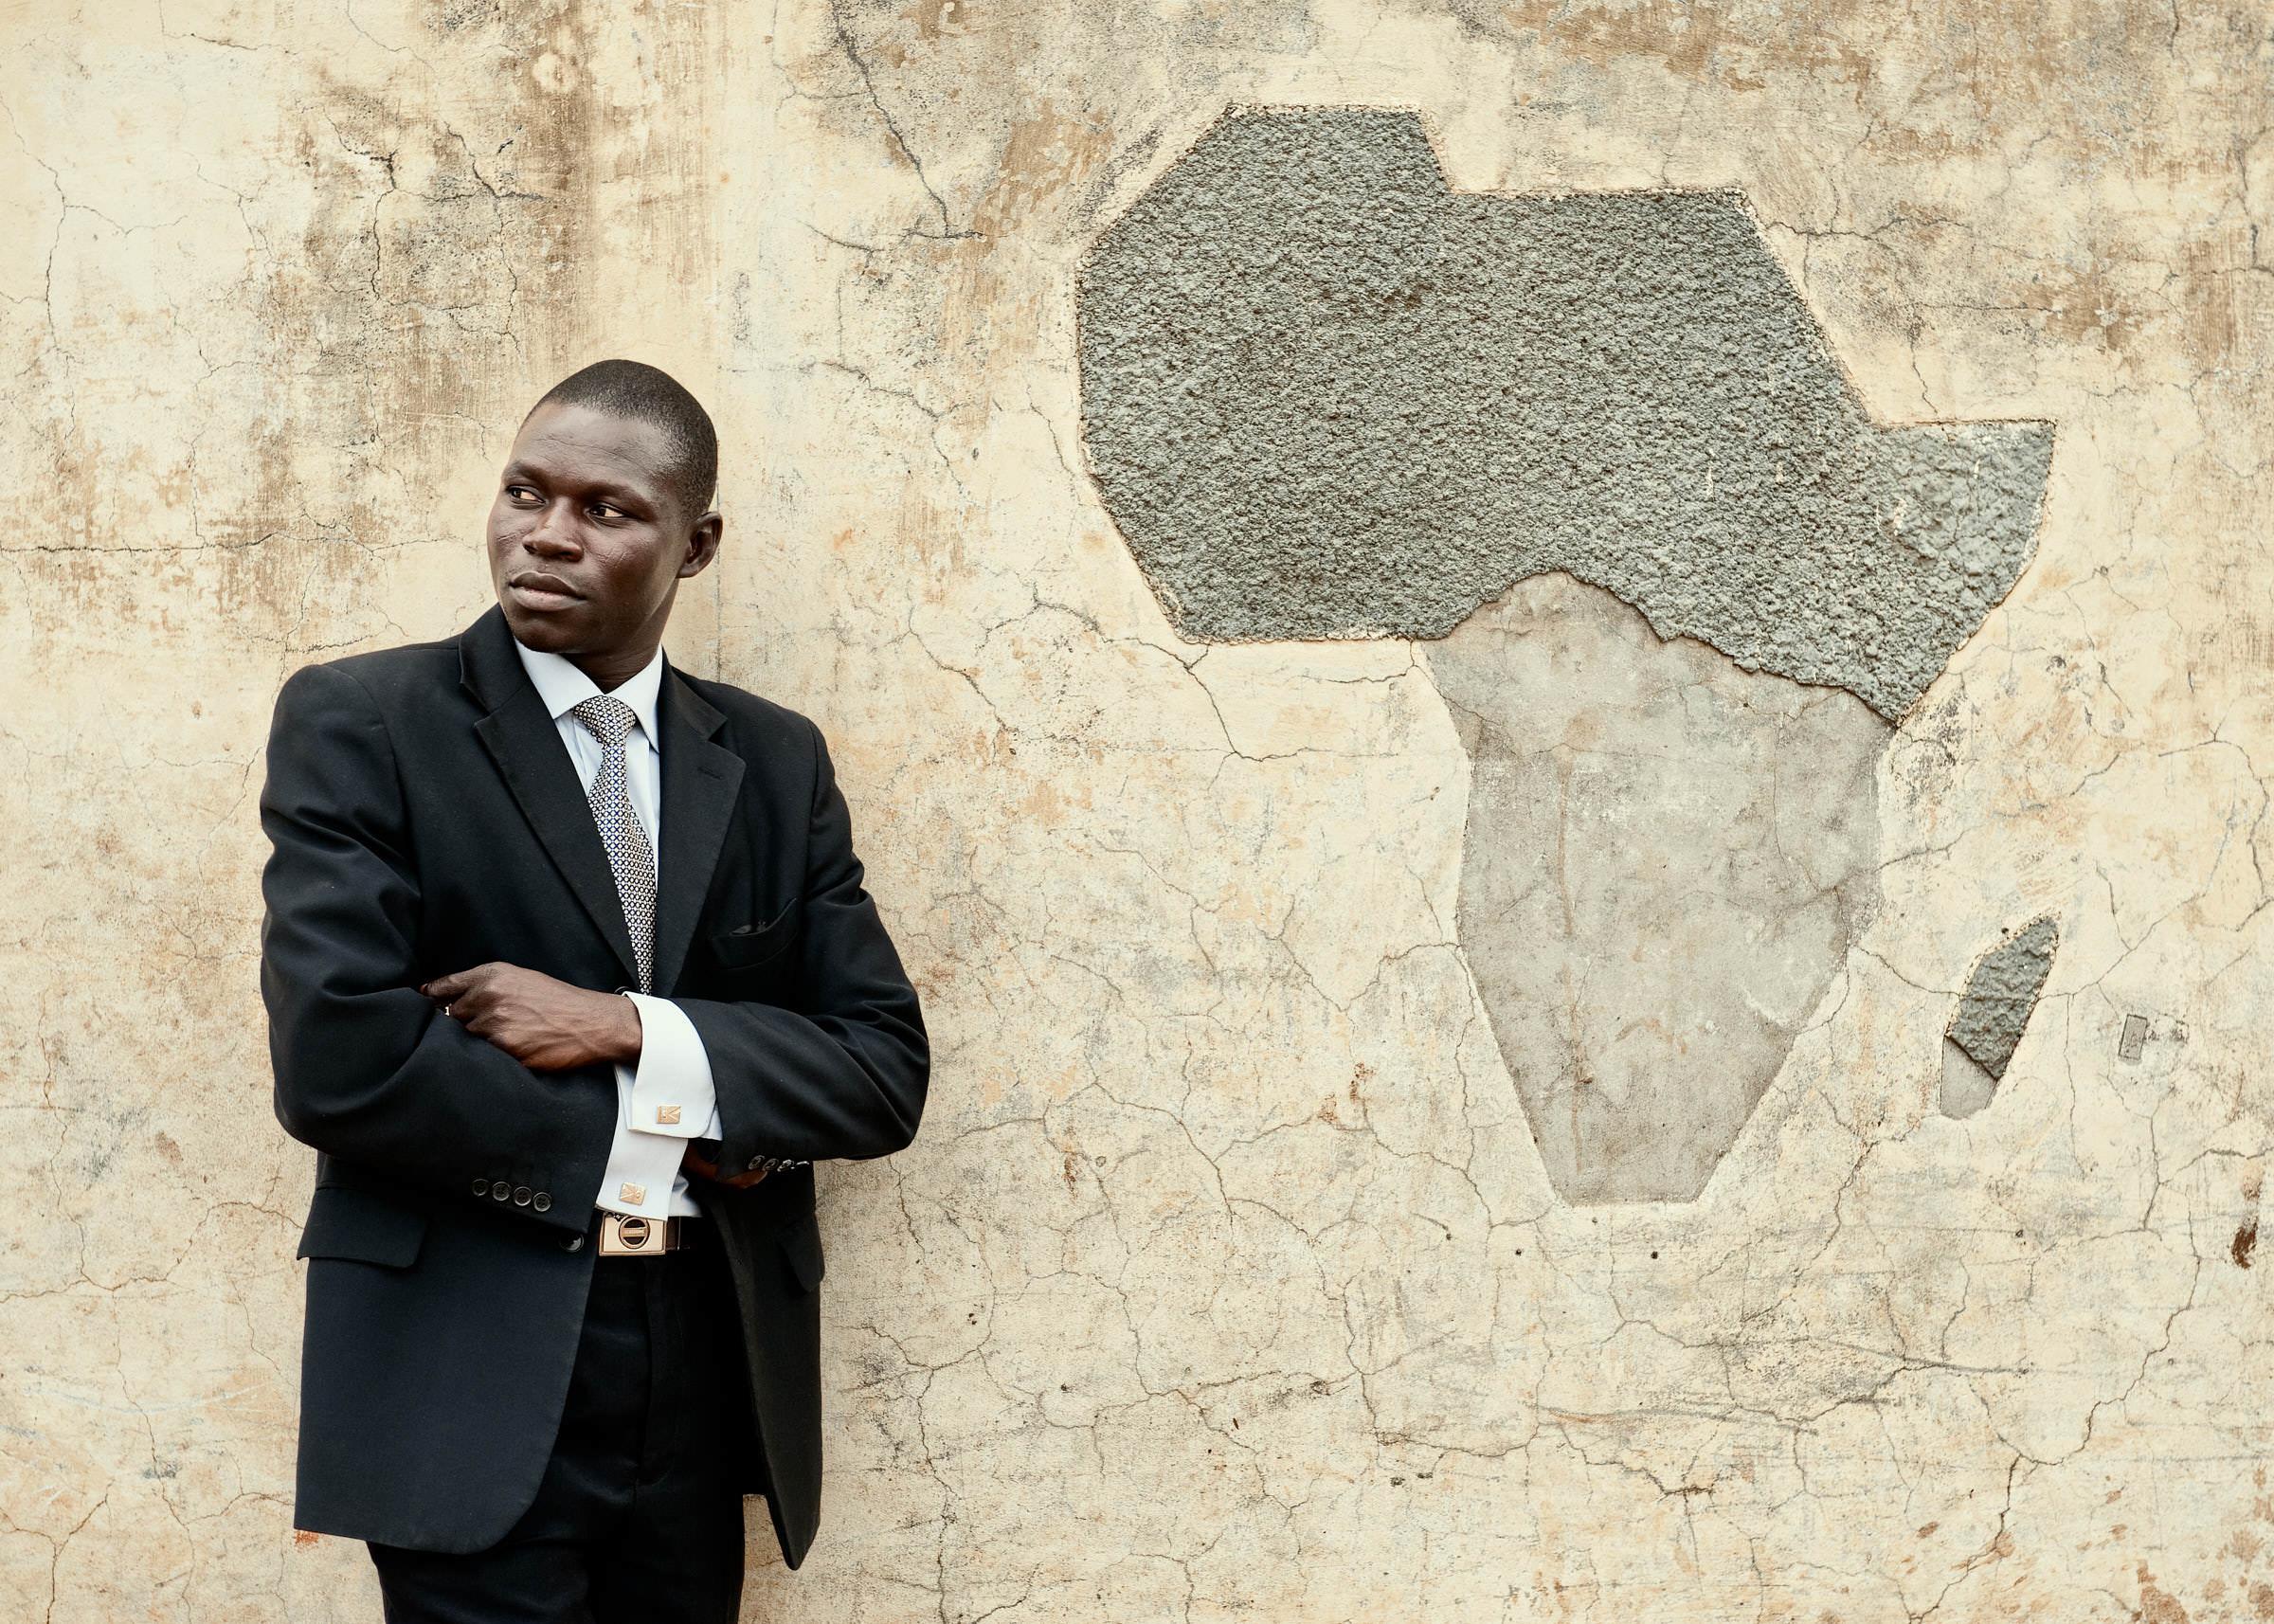 Portfolio_481_Voices_Africa_Togo print44_KRISTOFER SAMUELSSON PHOTOGRAPHY.jpg